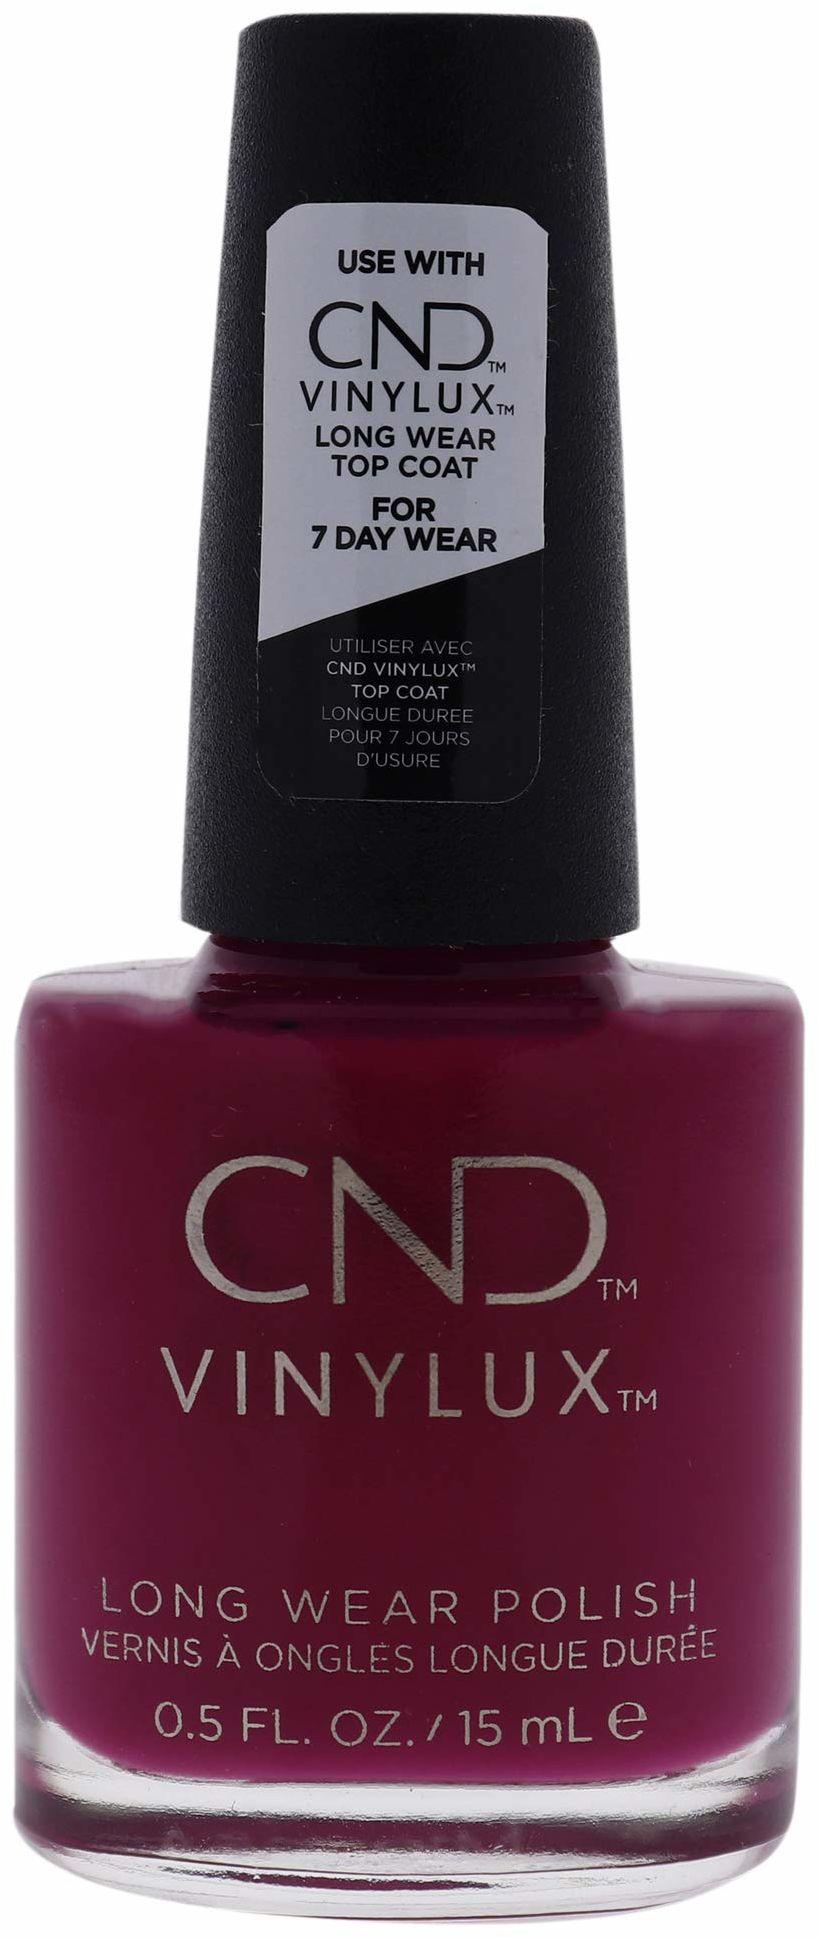 CND Vinylux ultrafioletowe, 1 opakowanie (1 x 15 ml)